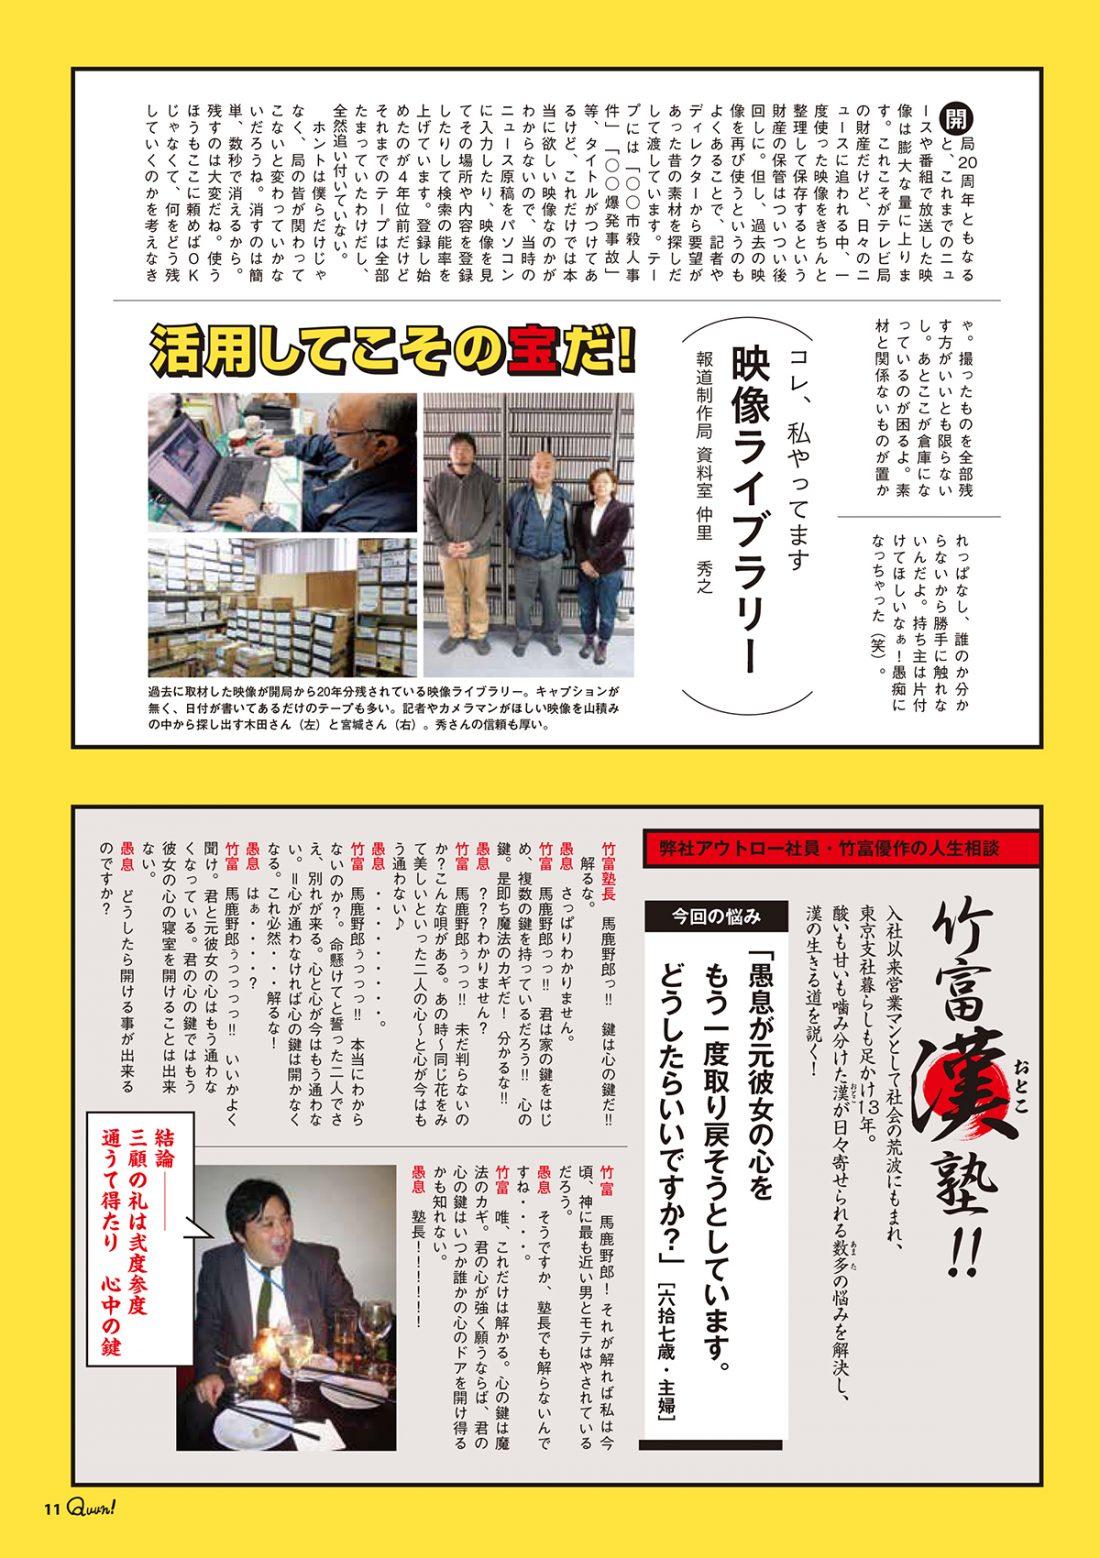 http://www.qab.co.jp/qgoro/wp-content/uploads/quun_0313-1100x1558.jpg